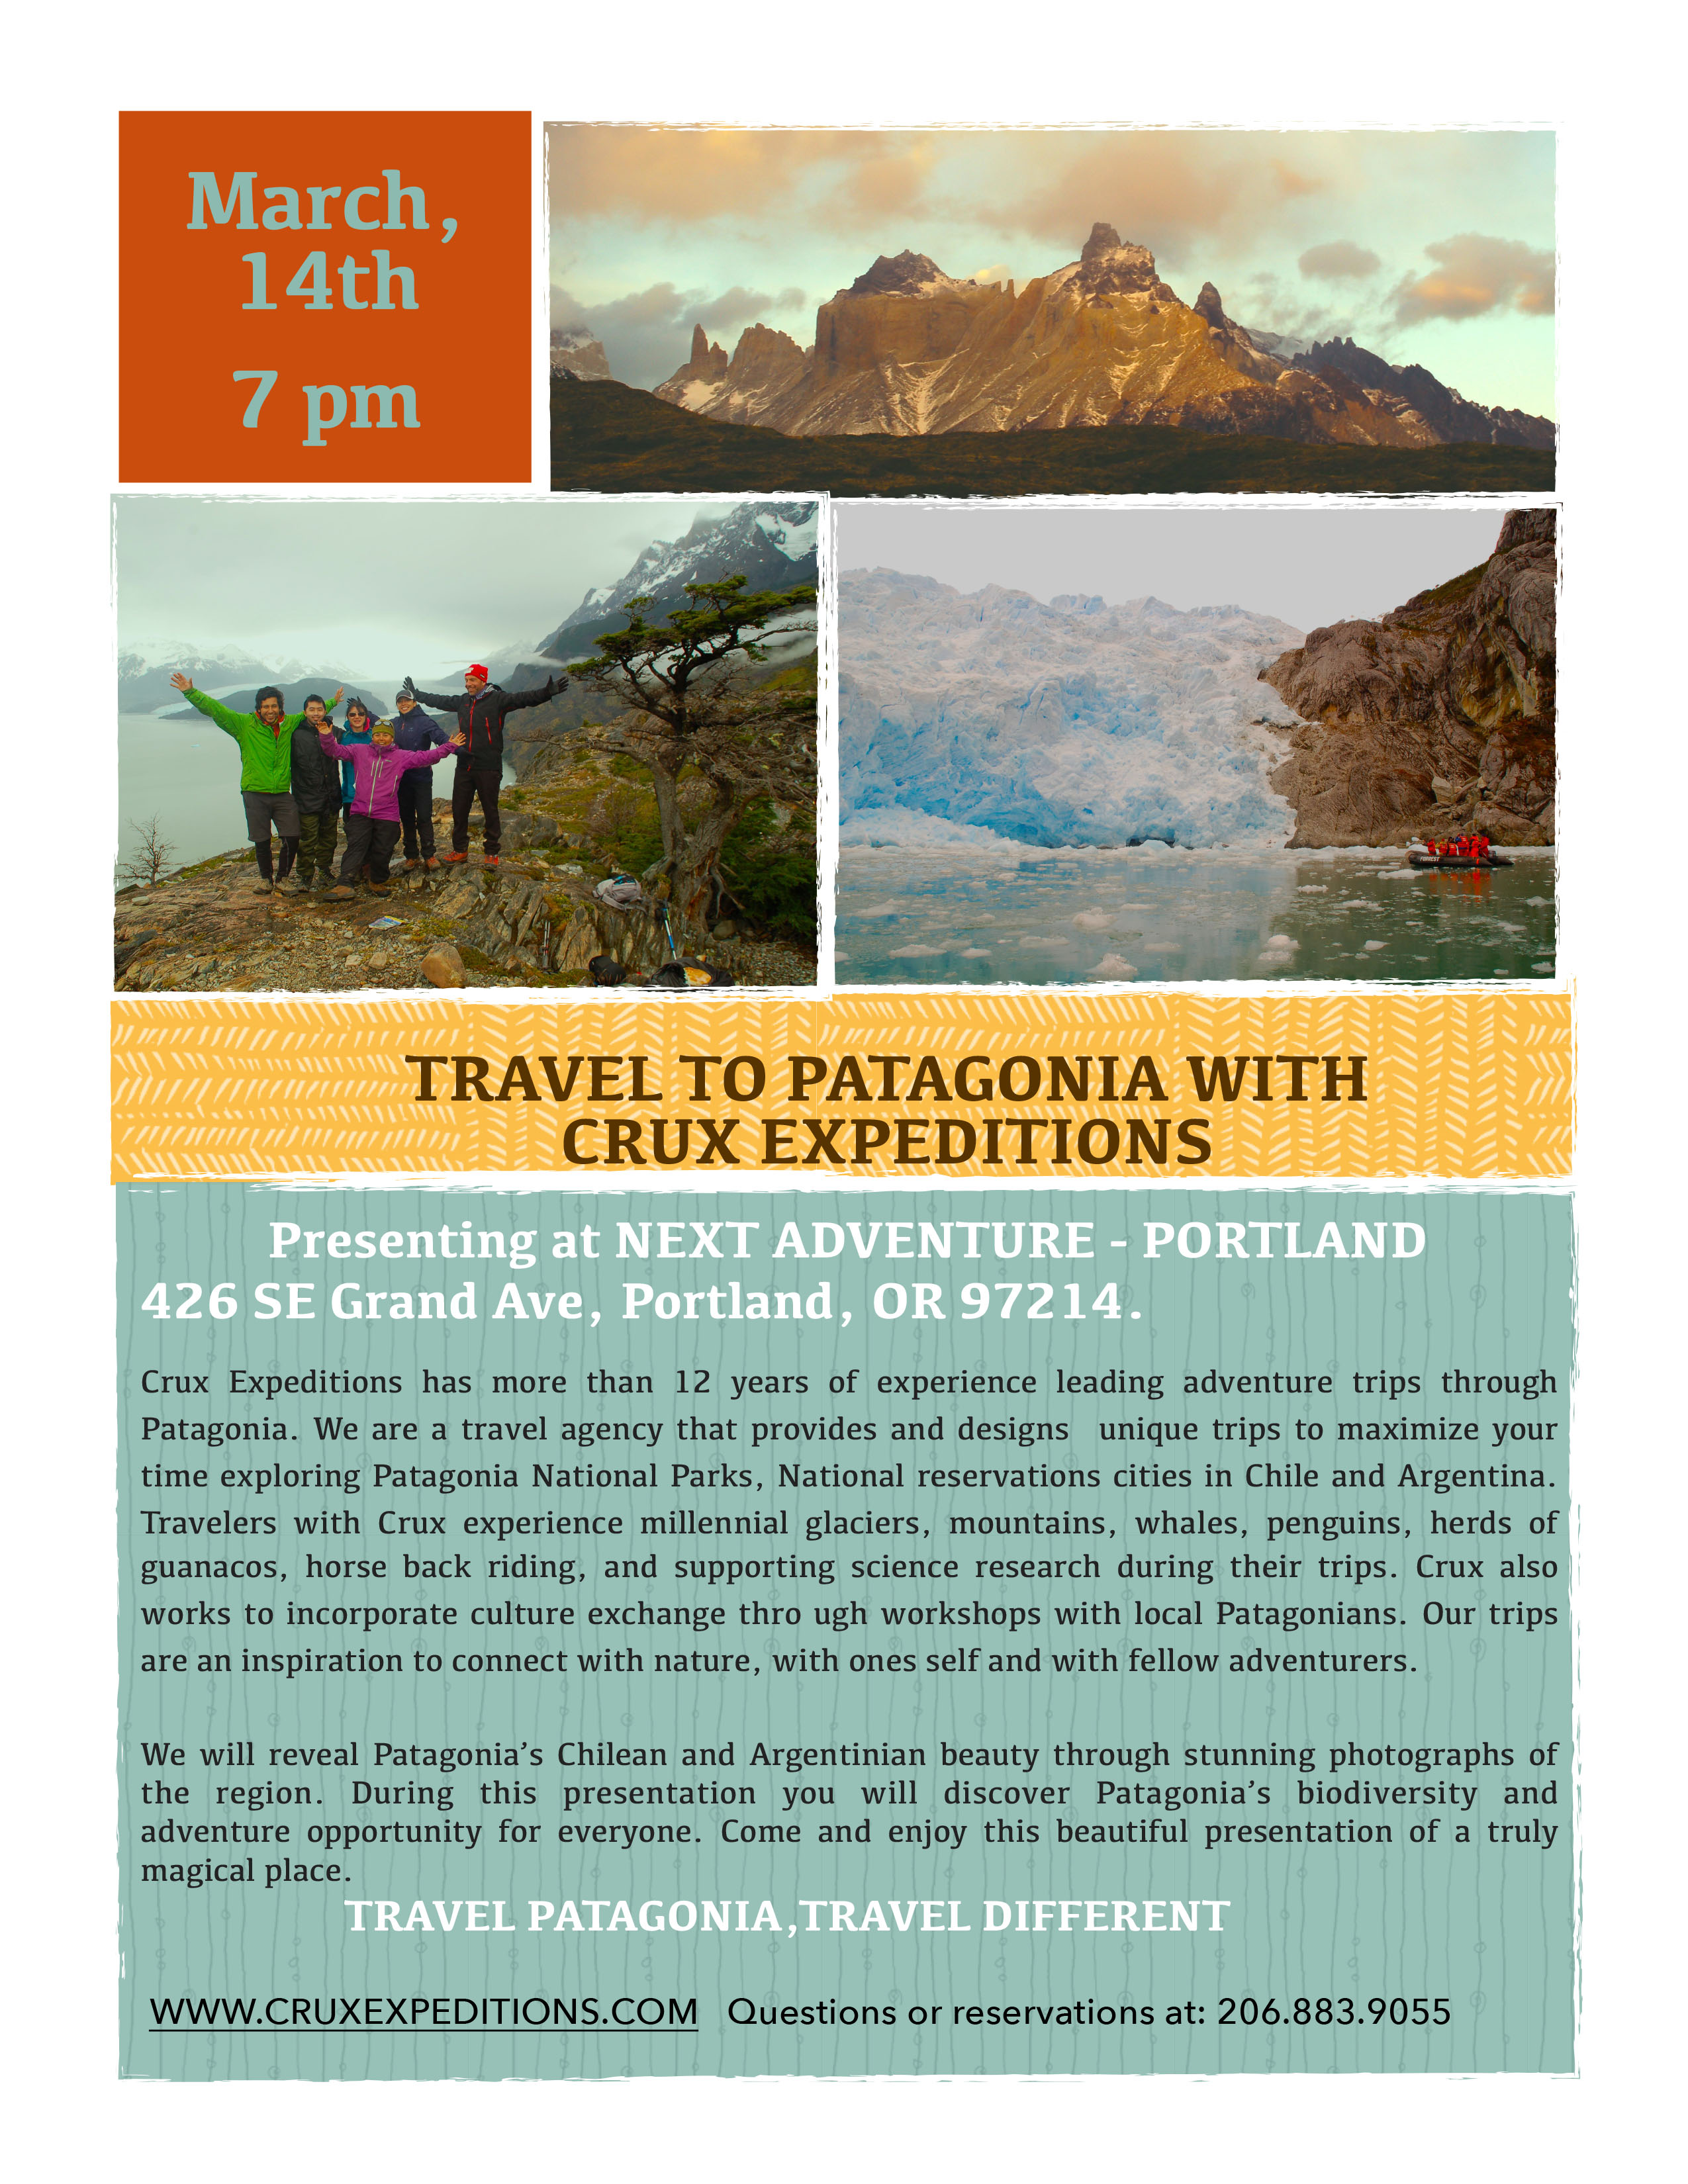 Patagonia presentation flyer